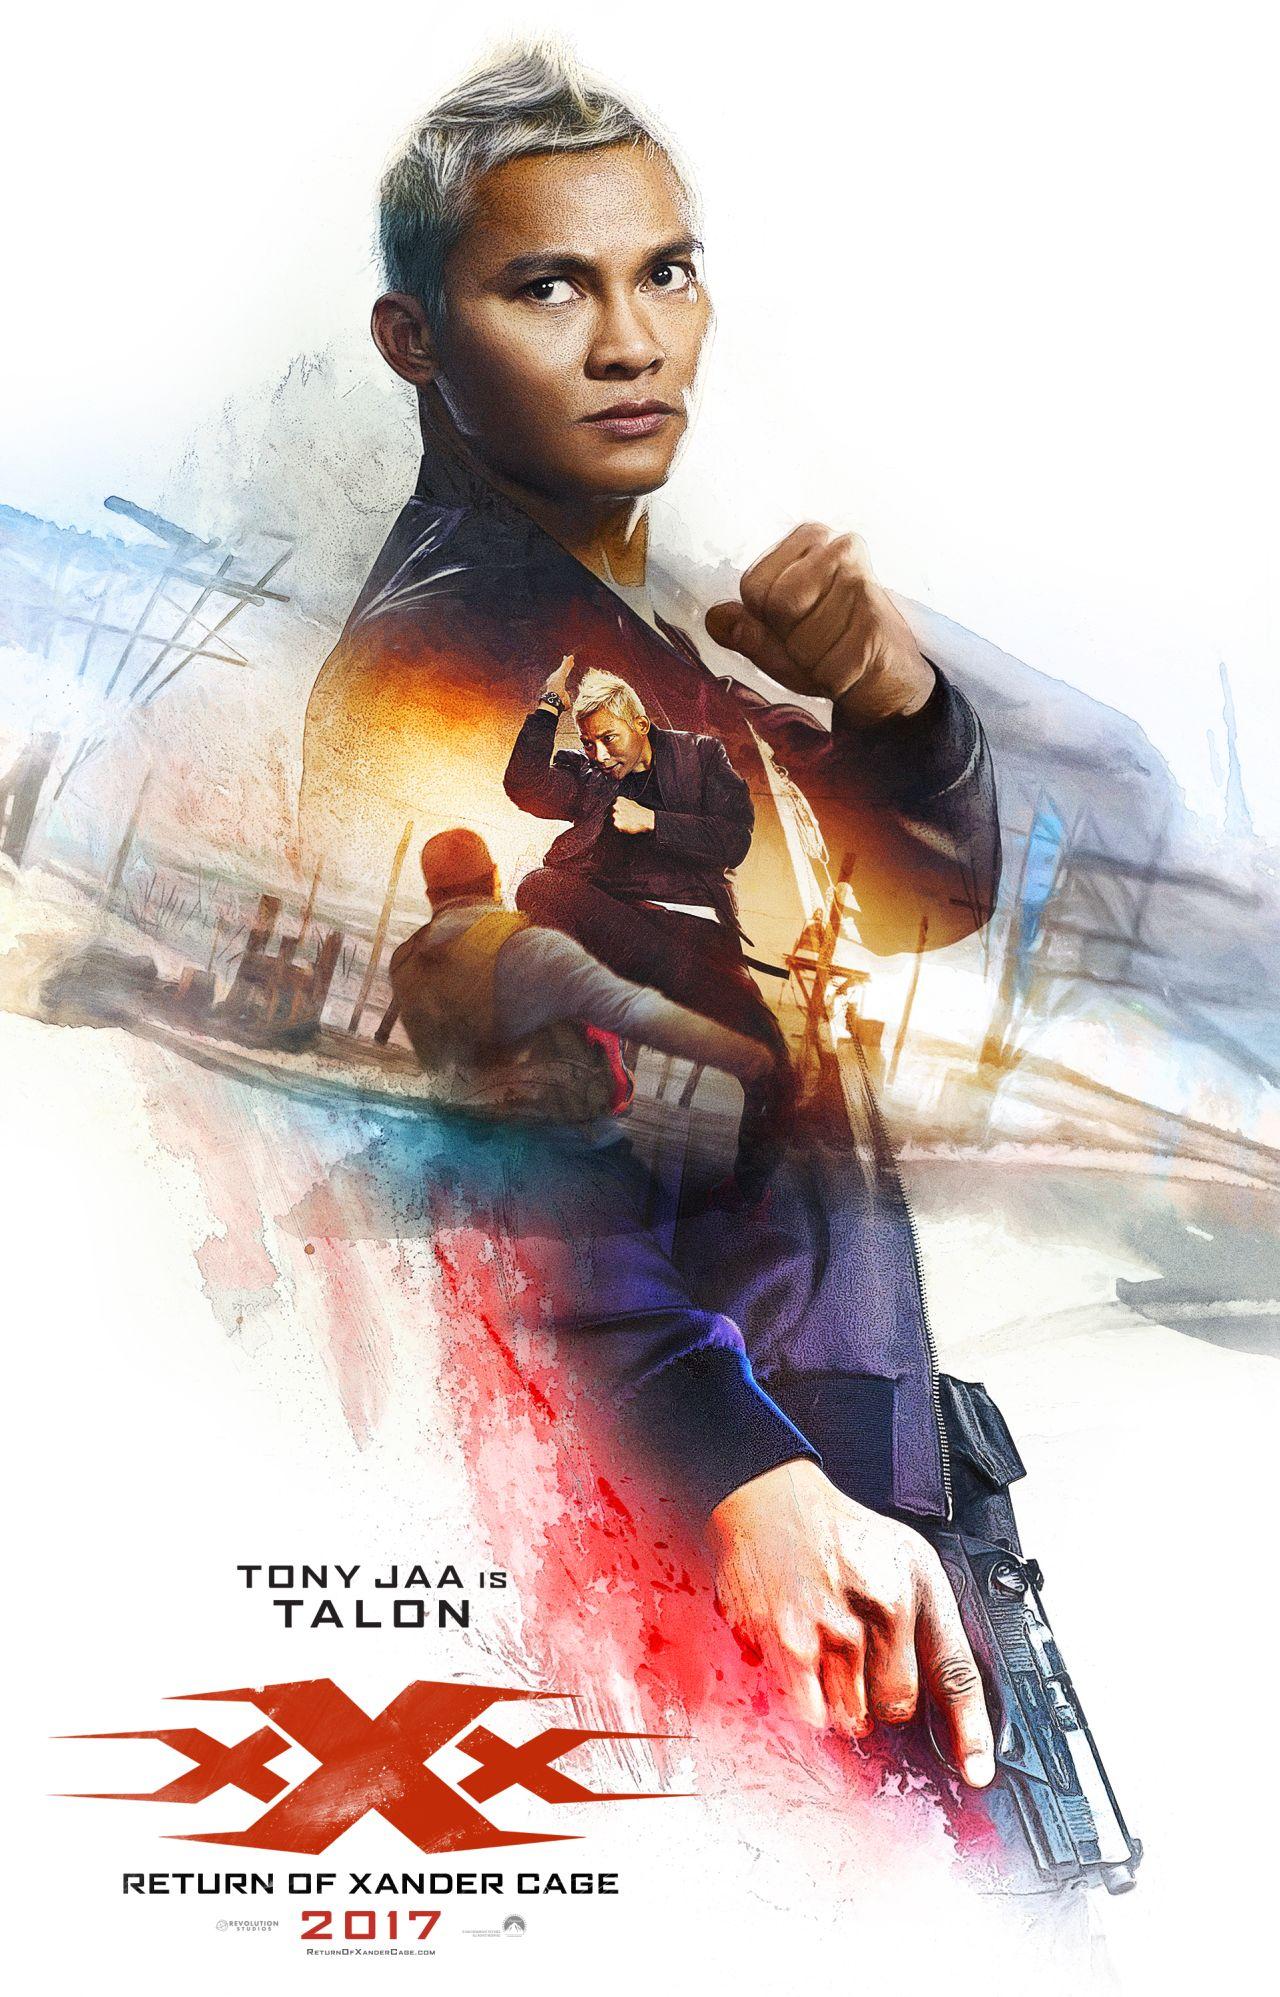 xXx: Return of Xander Cage - Il character poster di Tony Jaa